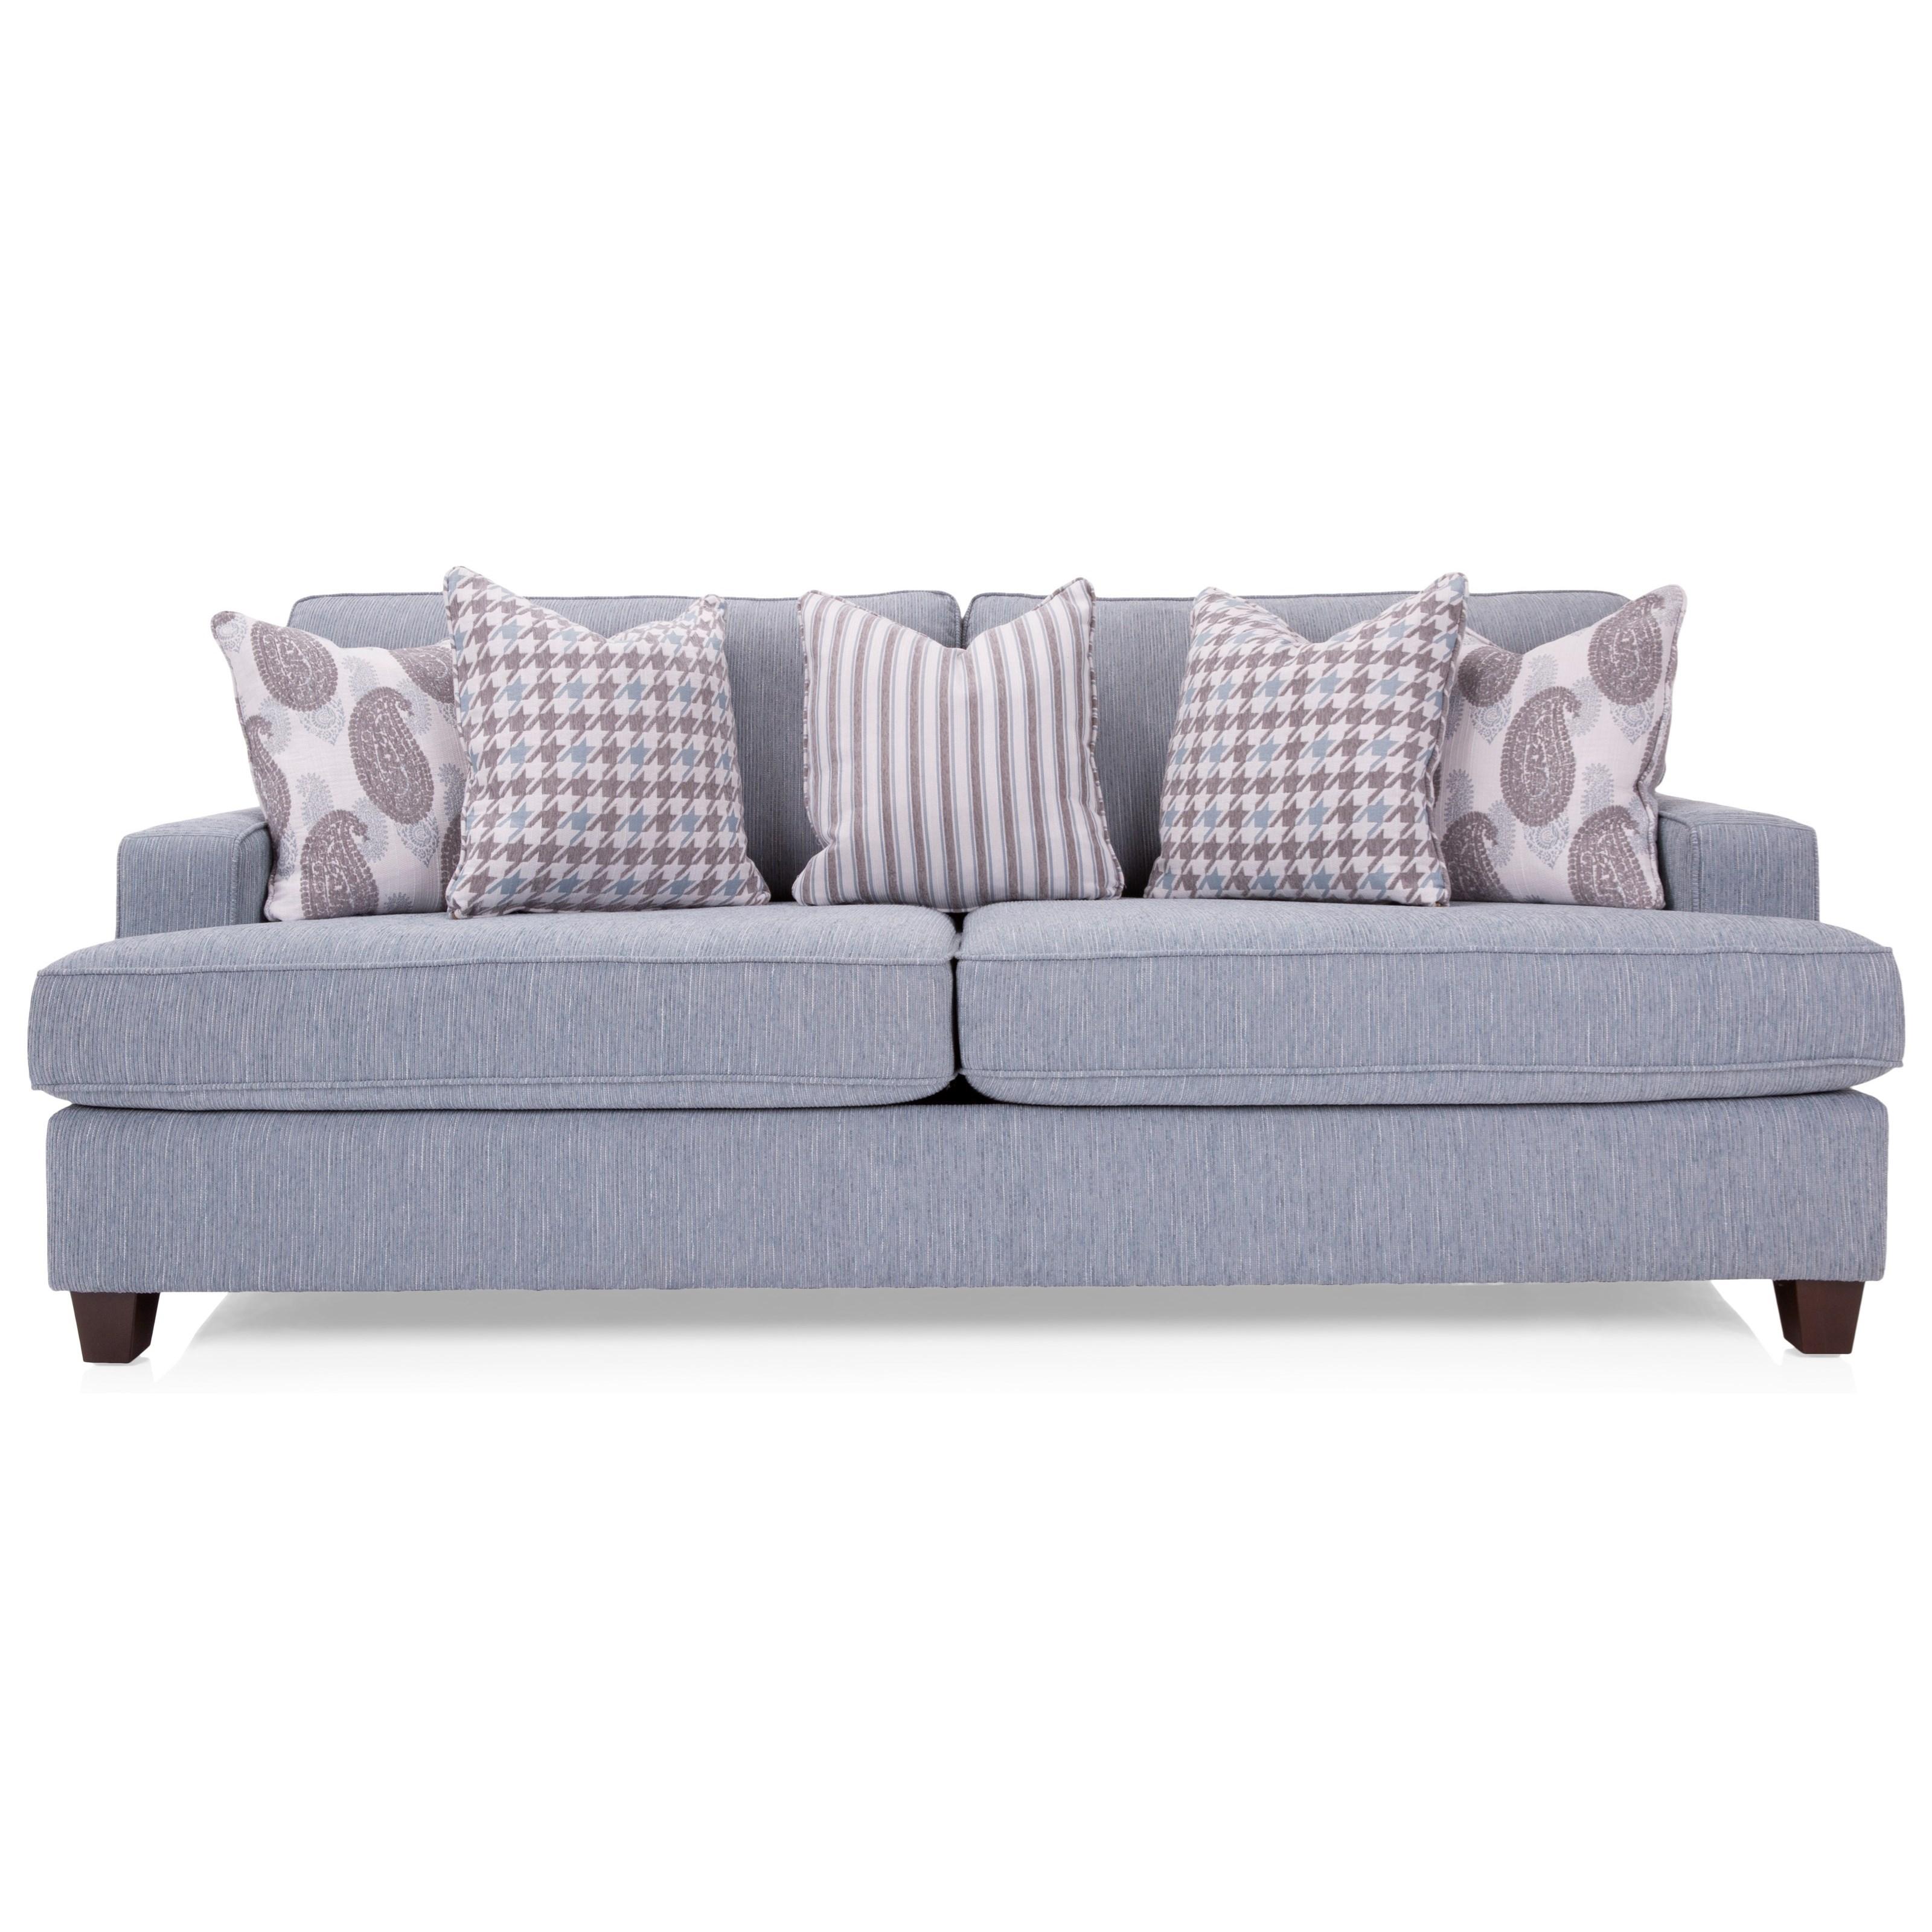 2052 Sofa by Decor-Rest at Johnny Janosik